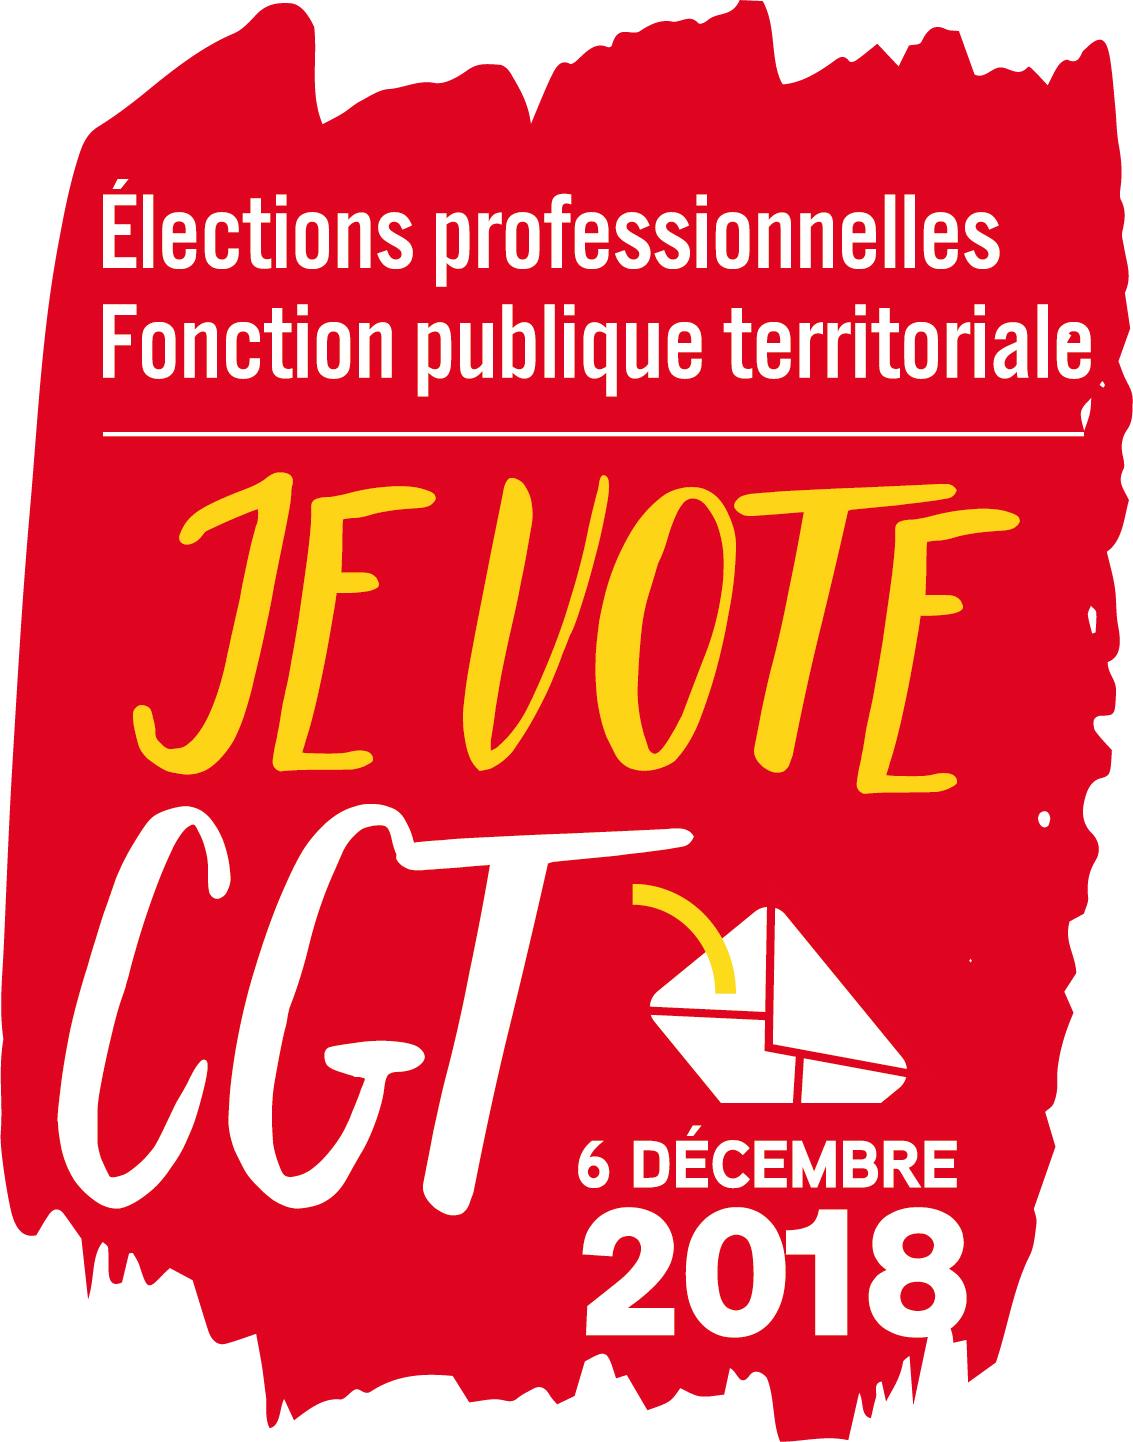 logo-electionspro2018-1.jpg